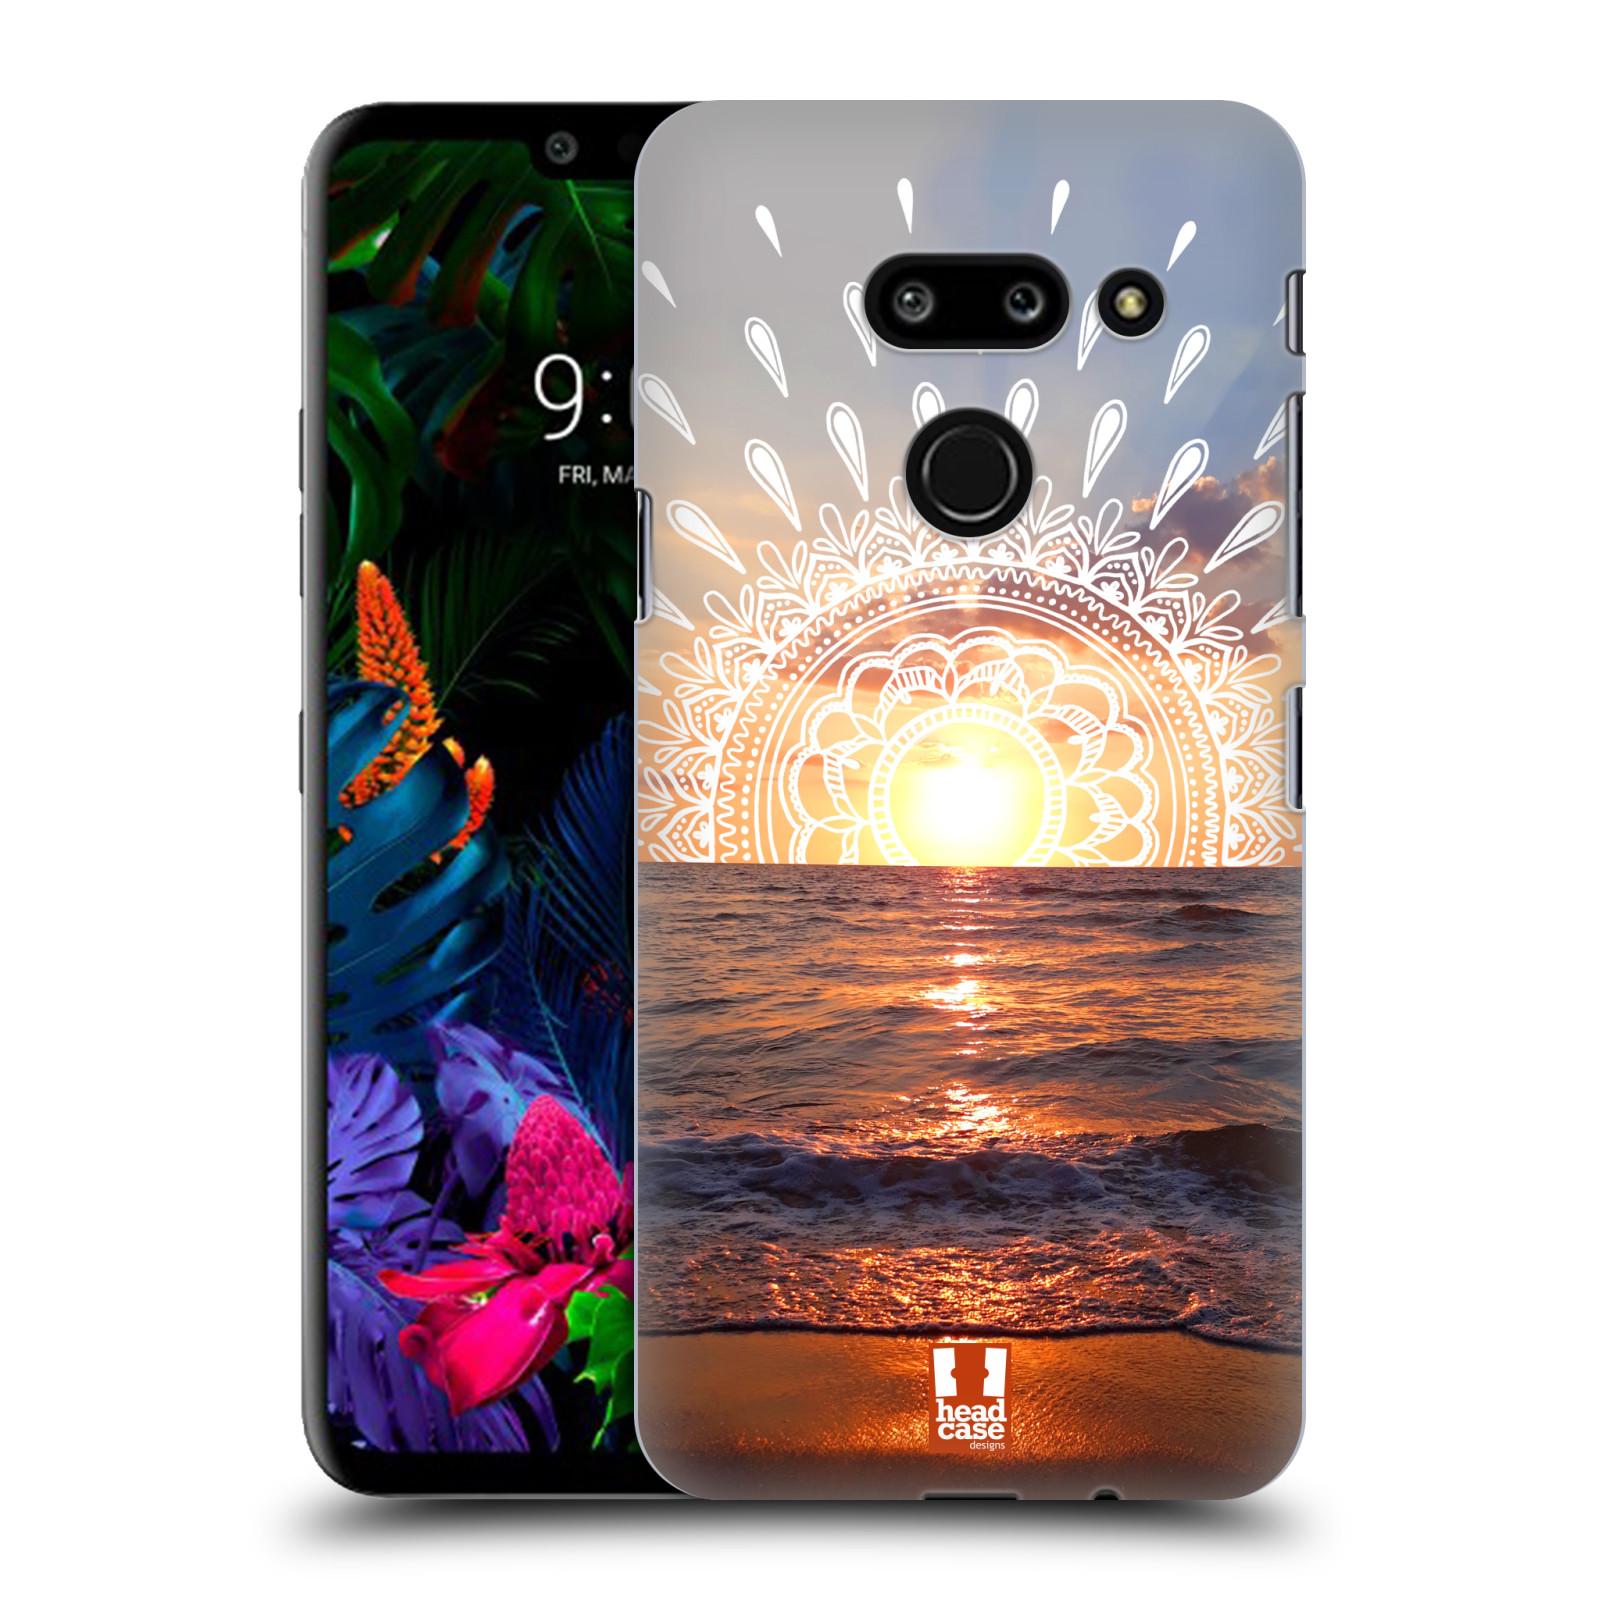 Pouzdro na mobil LG G8 ThinQ - HEAD CASE - doodle západ slunce